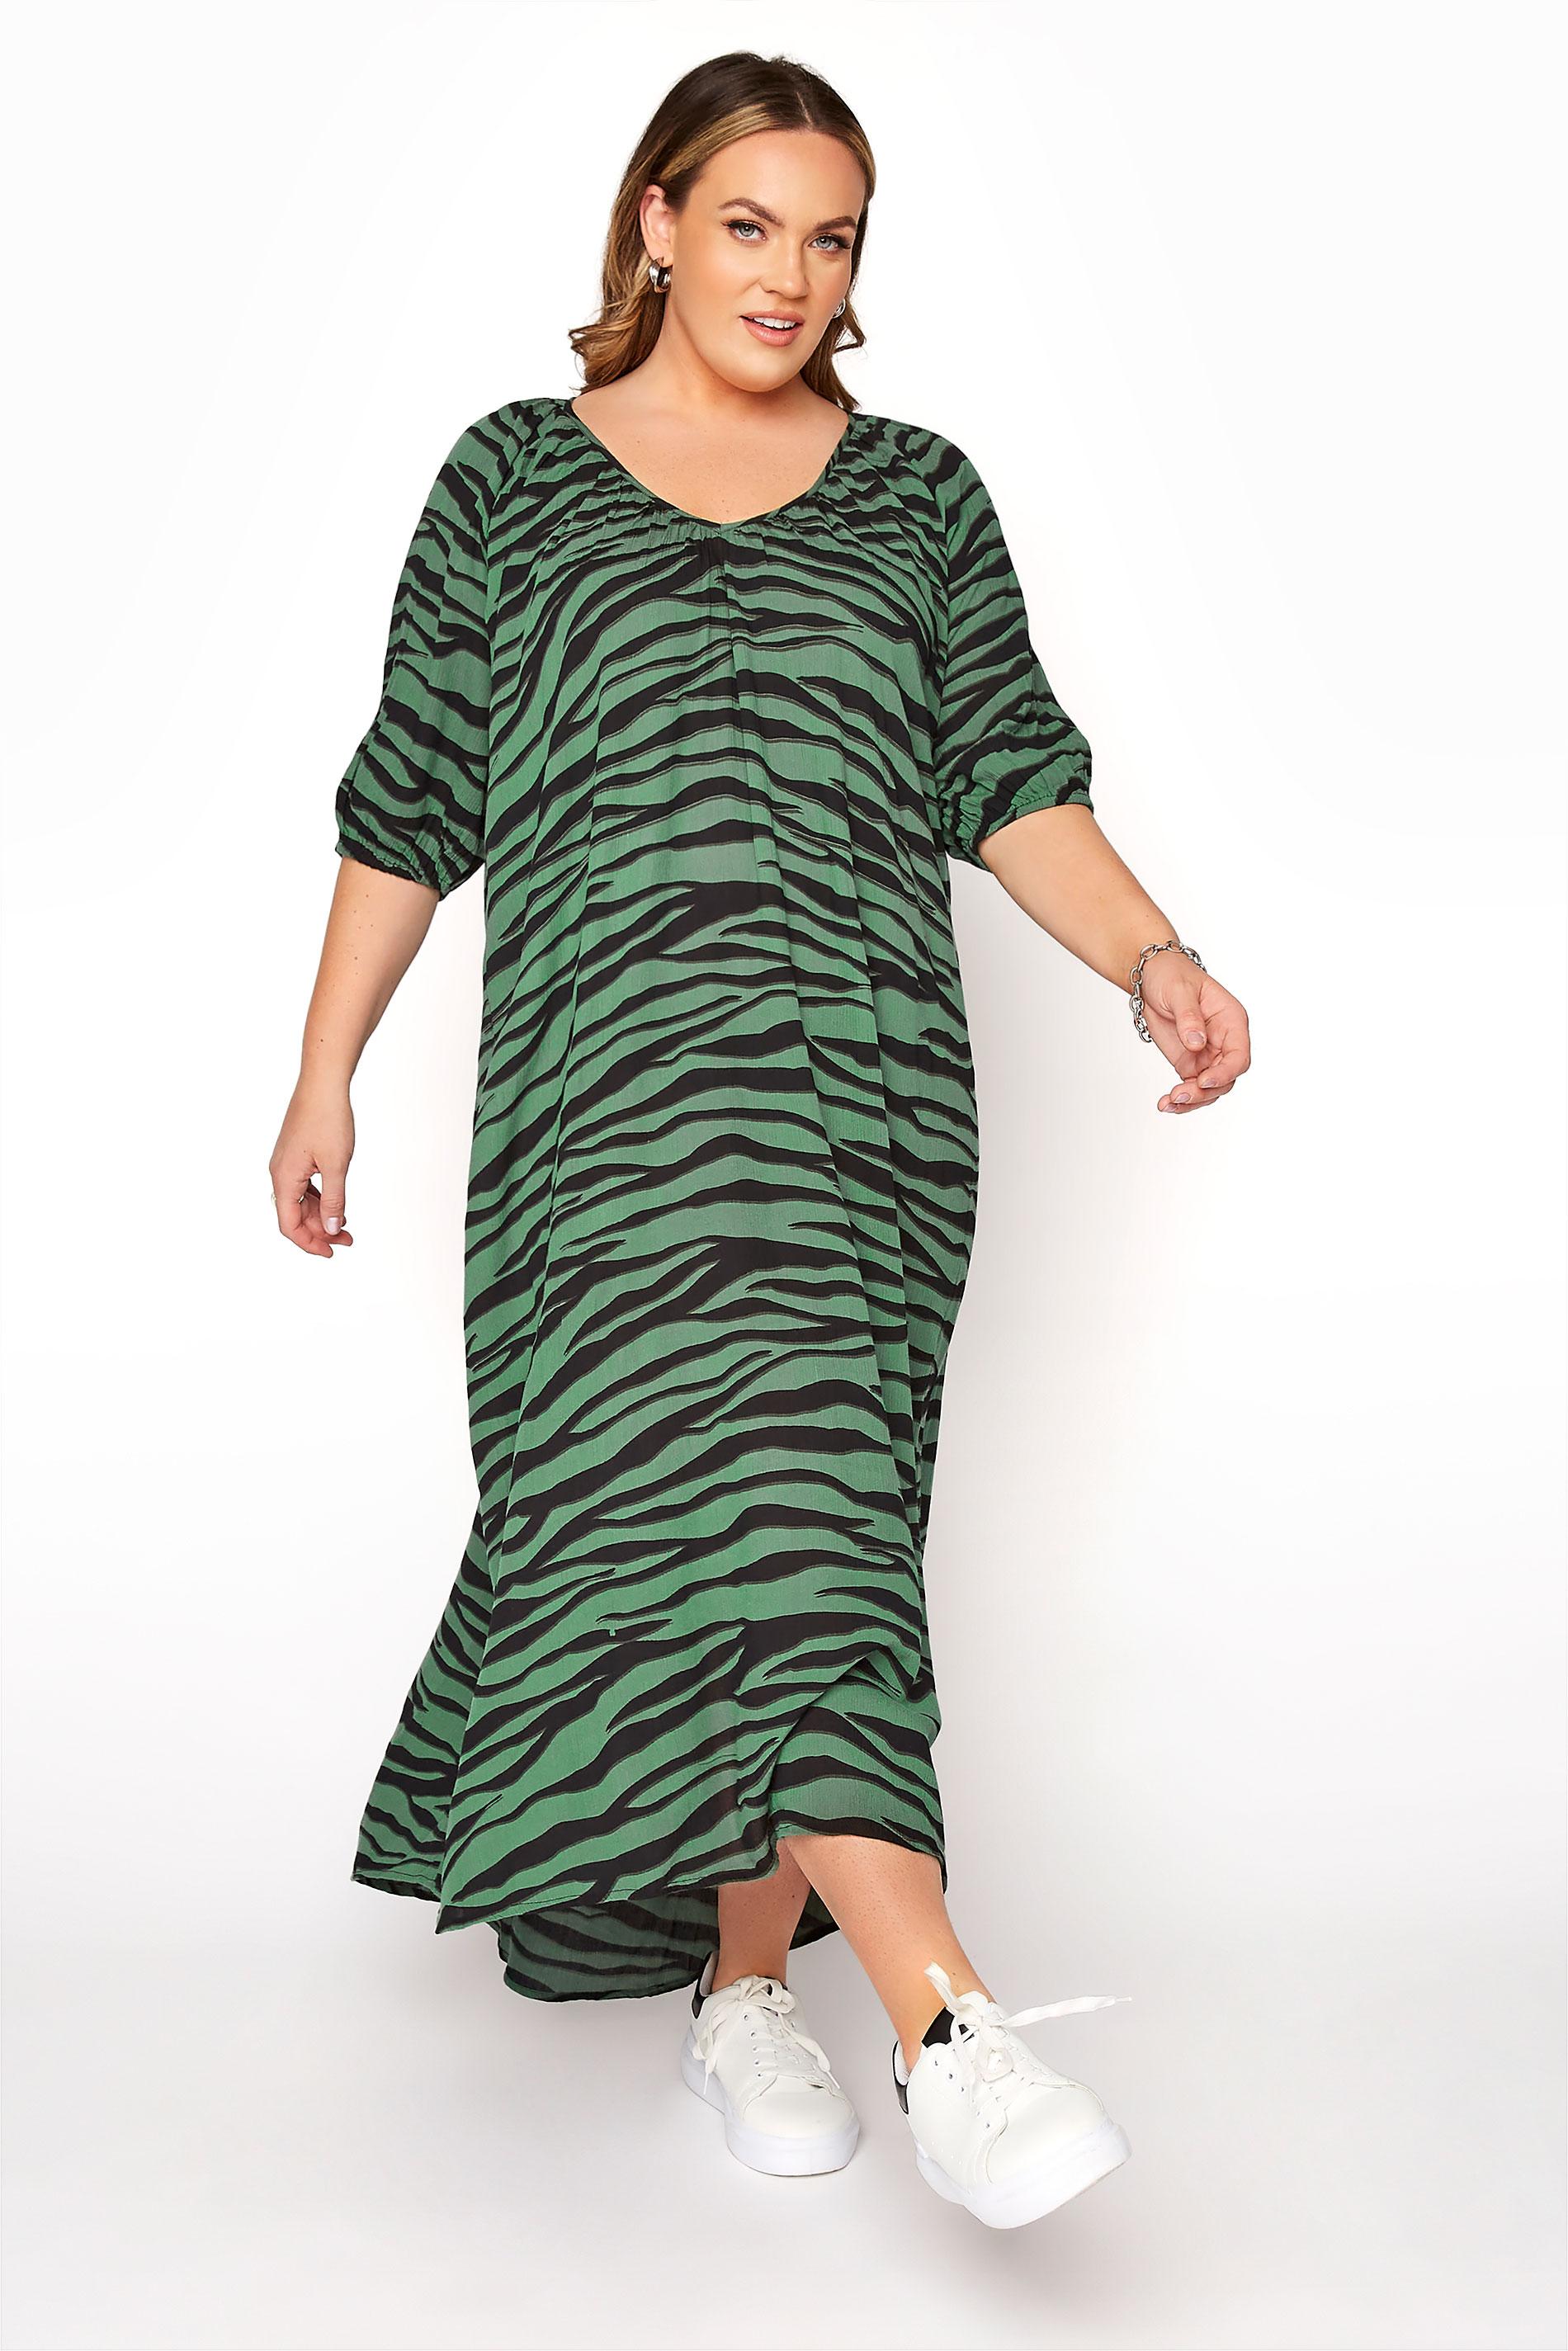 LIMITED COLLECTION Green Zebra Print Midaxi Dress_A.jpg